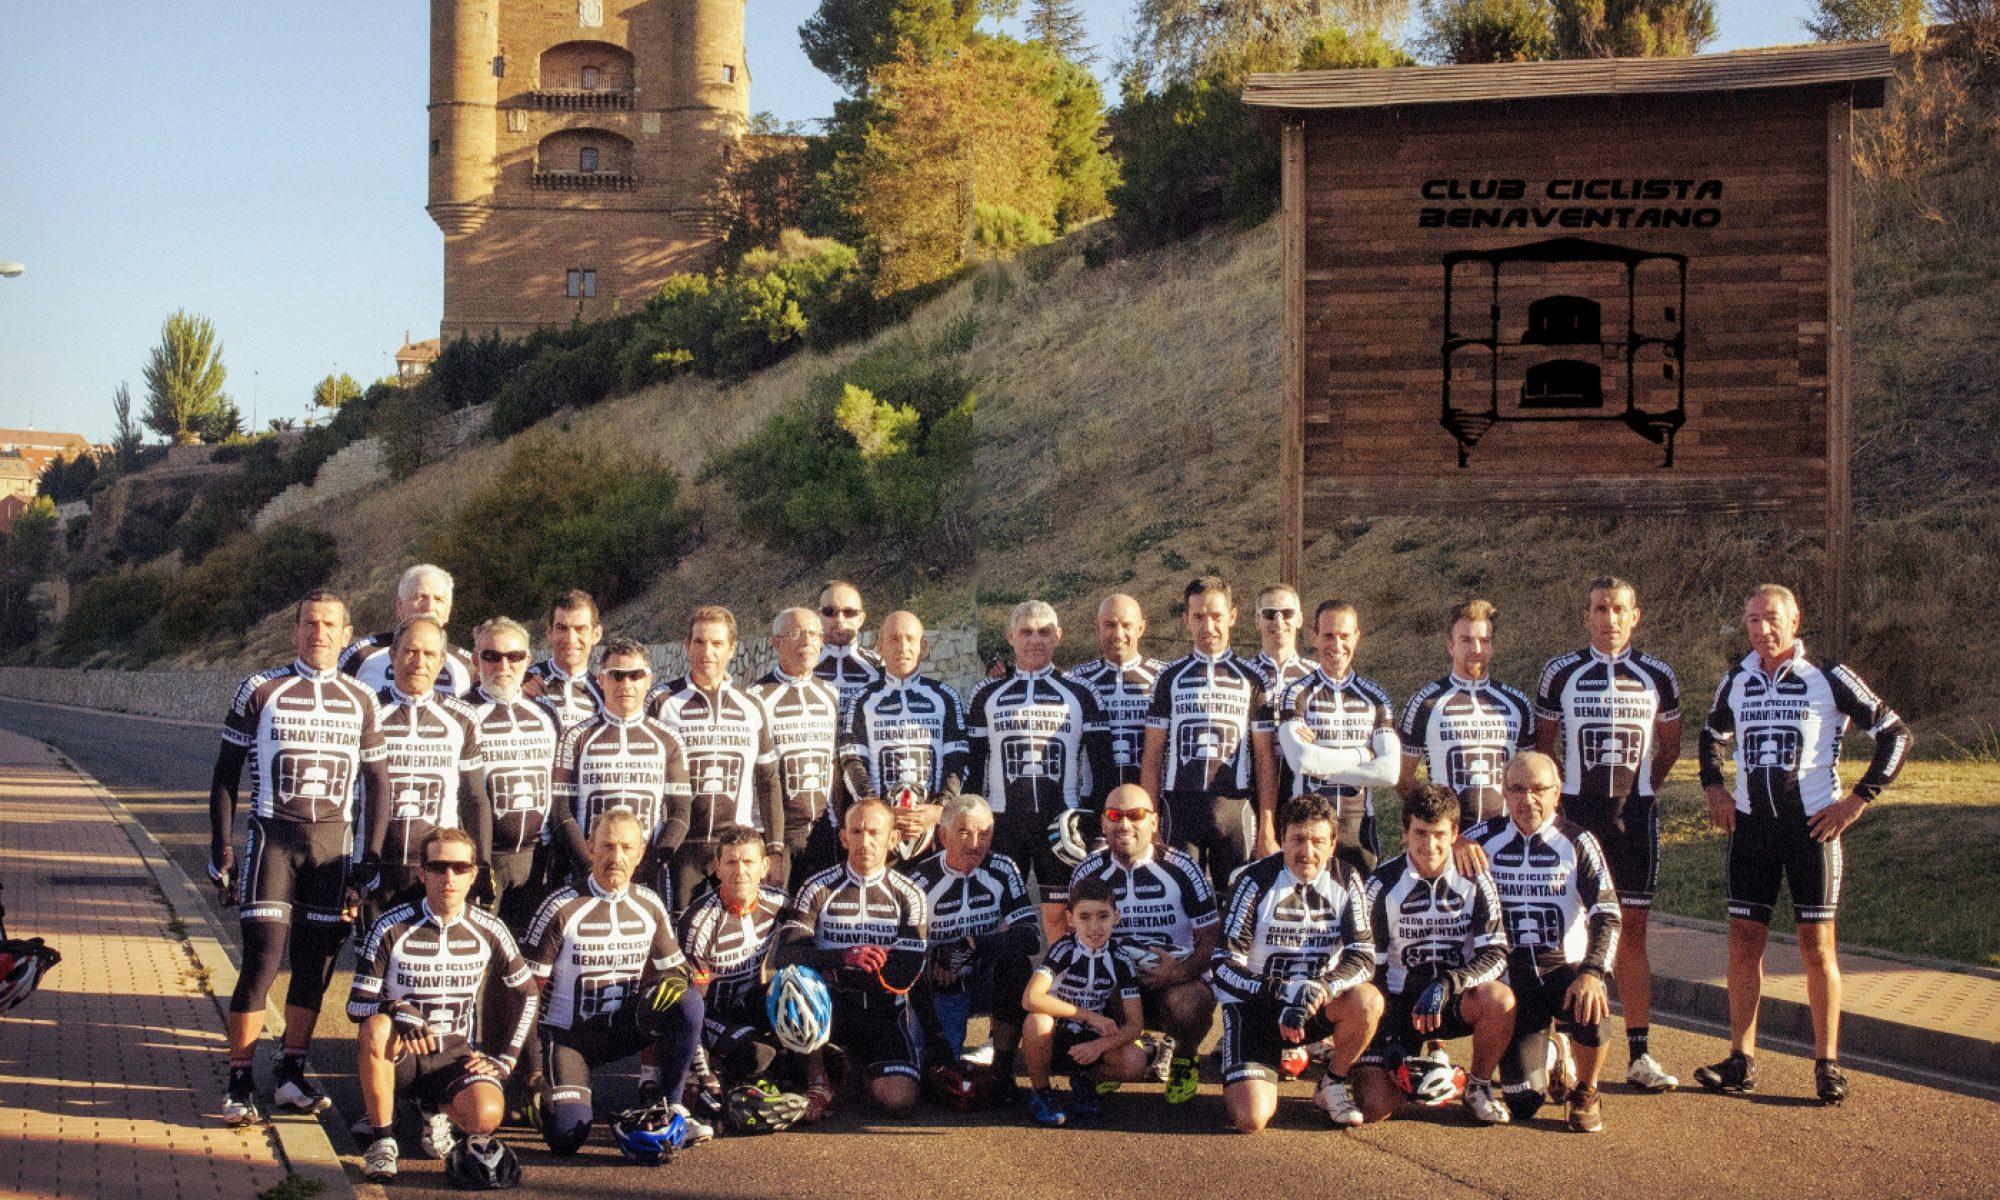 Club Ciclista Benaventano